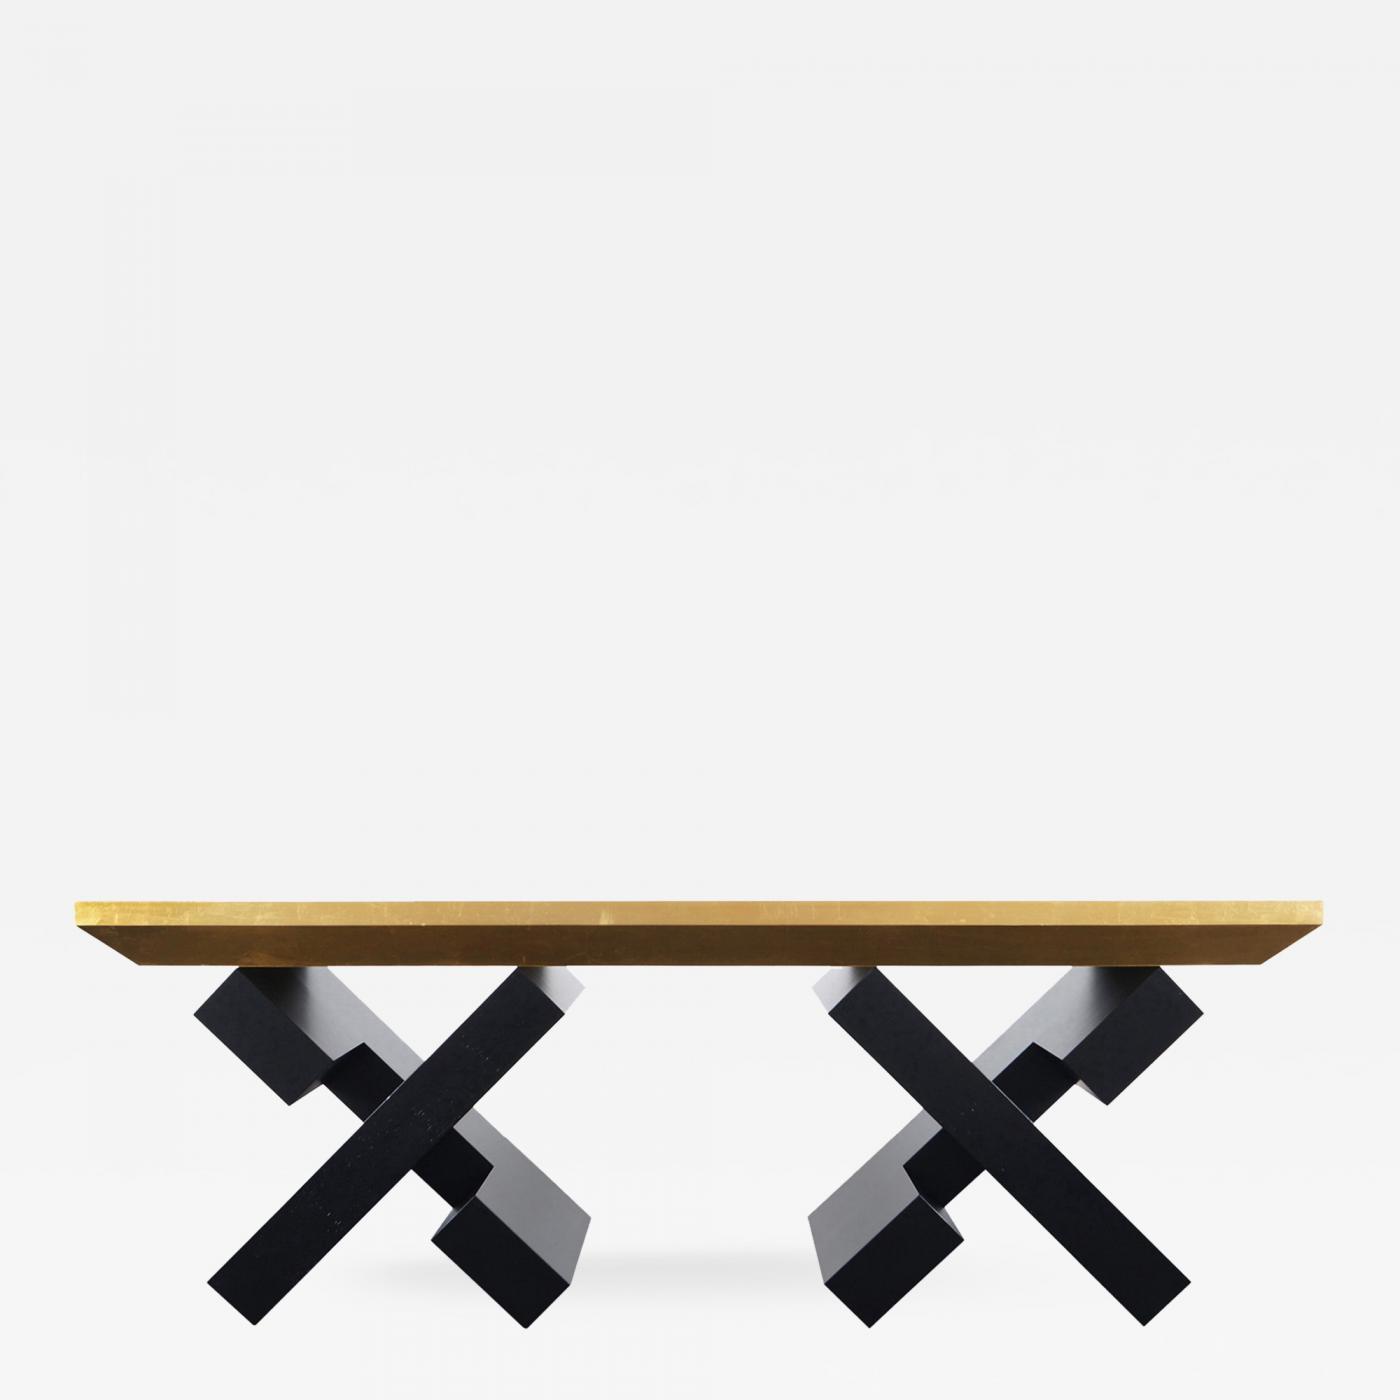 Listings / Furniture / Tables / Console U0026 Pier Tables · John Patton Duval  Vintage Gold Leaf ...